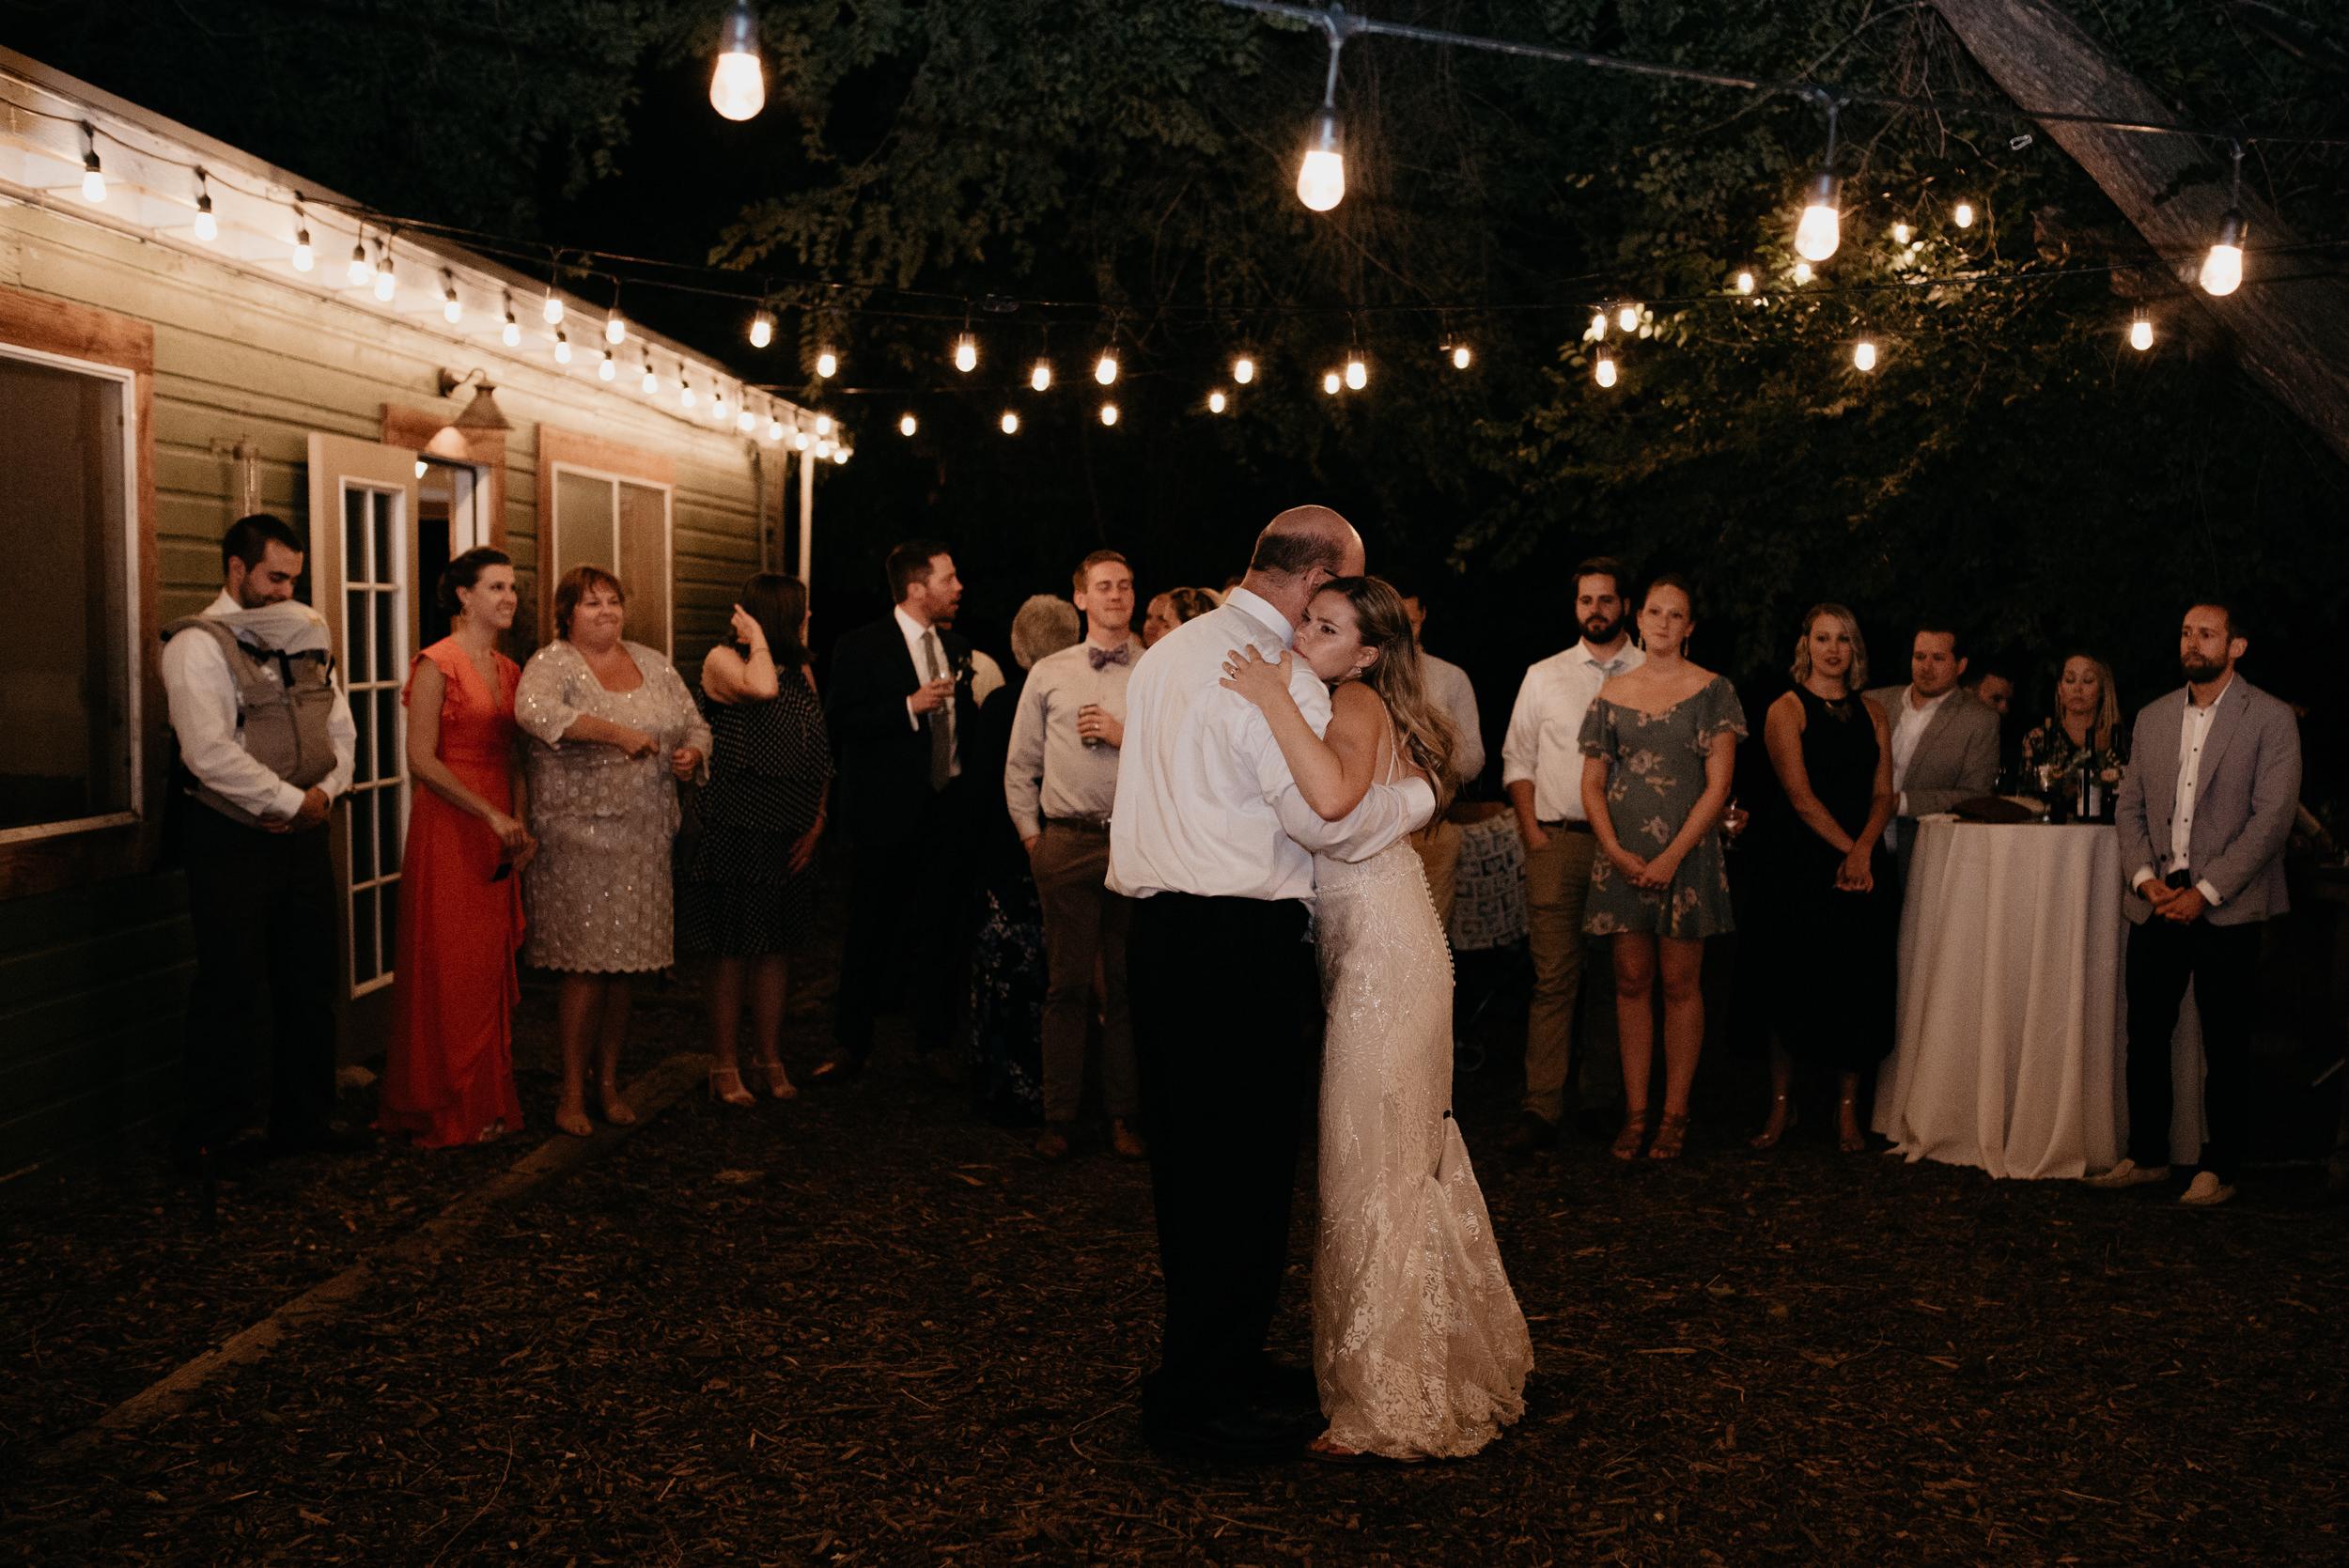 Colorado adventure boho wedding and elopement photographer.